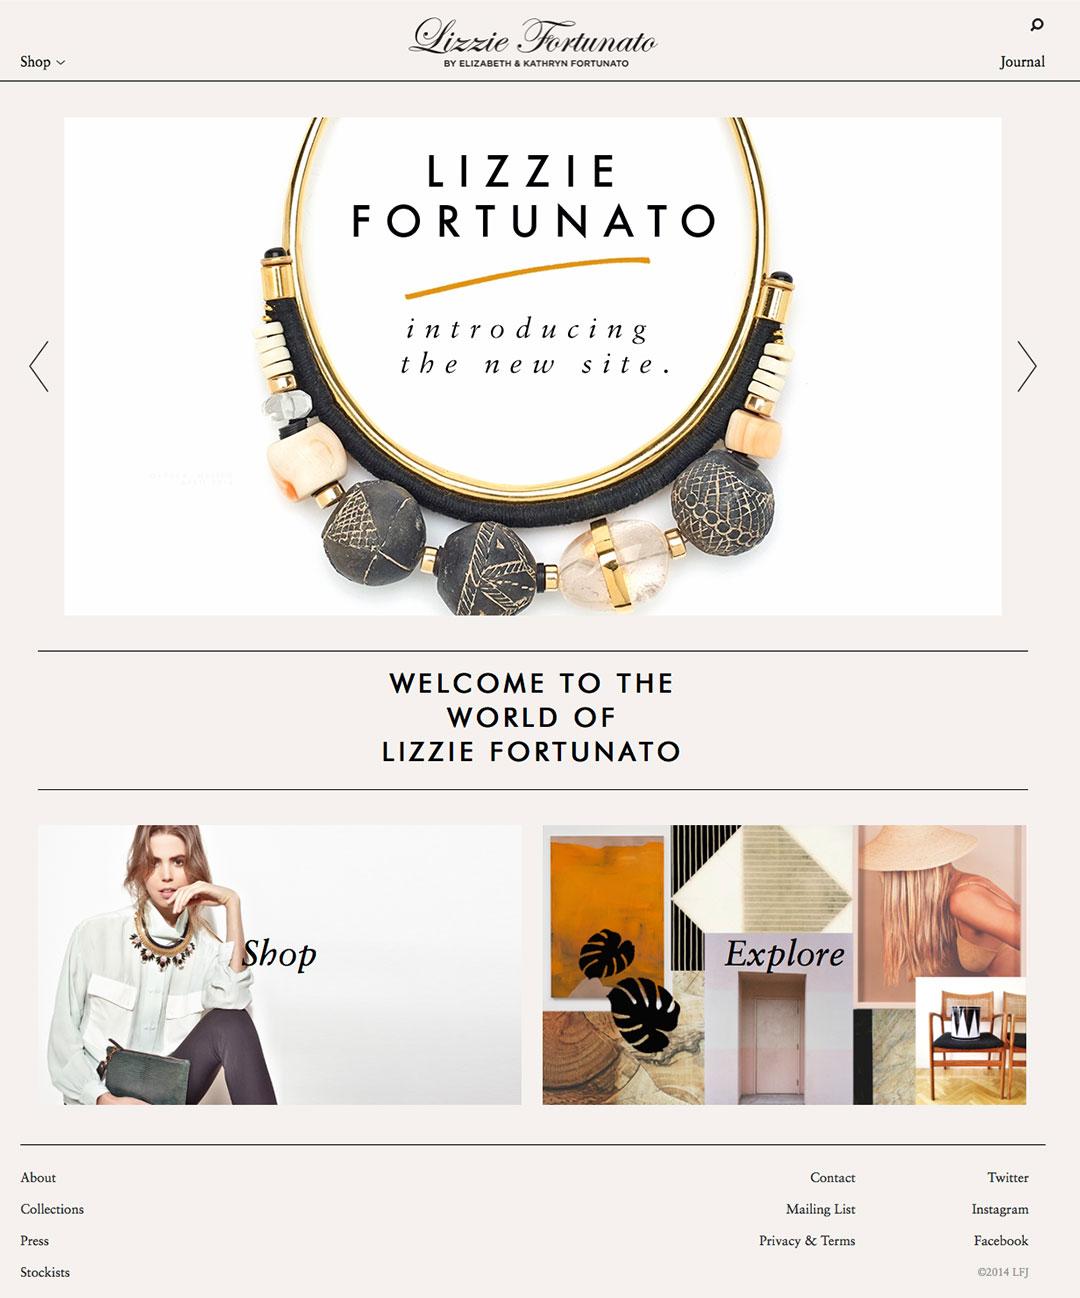 Lizzie Fortunato